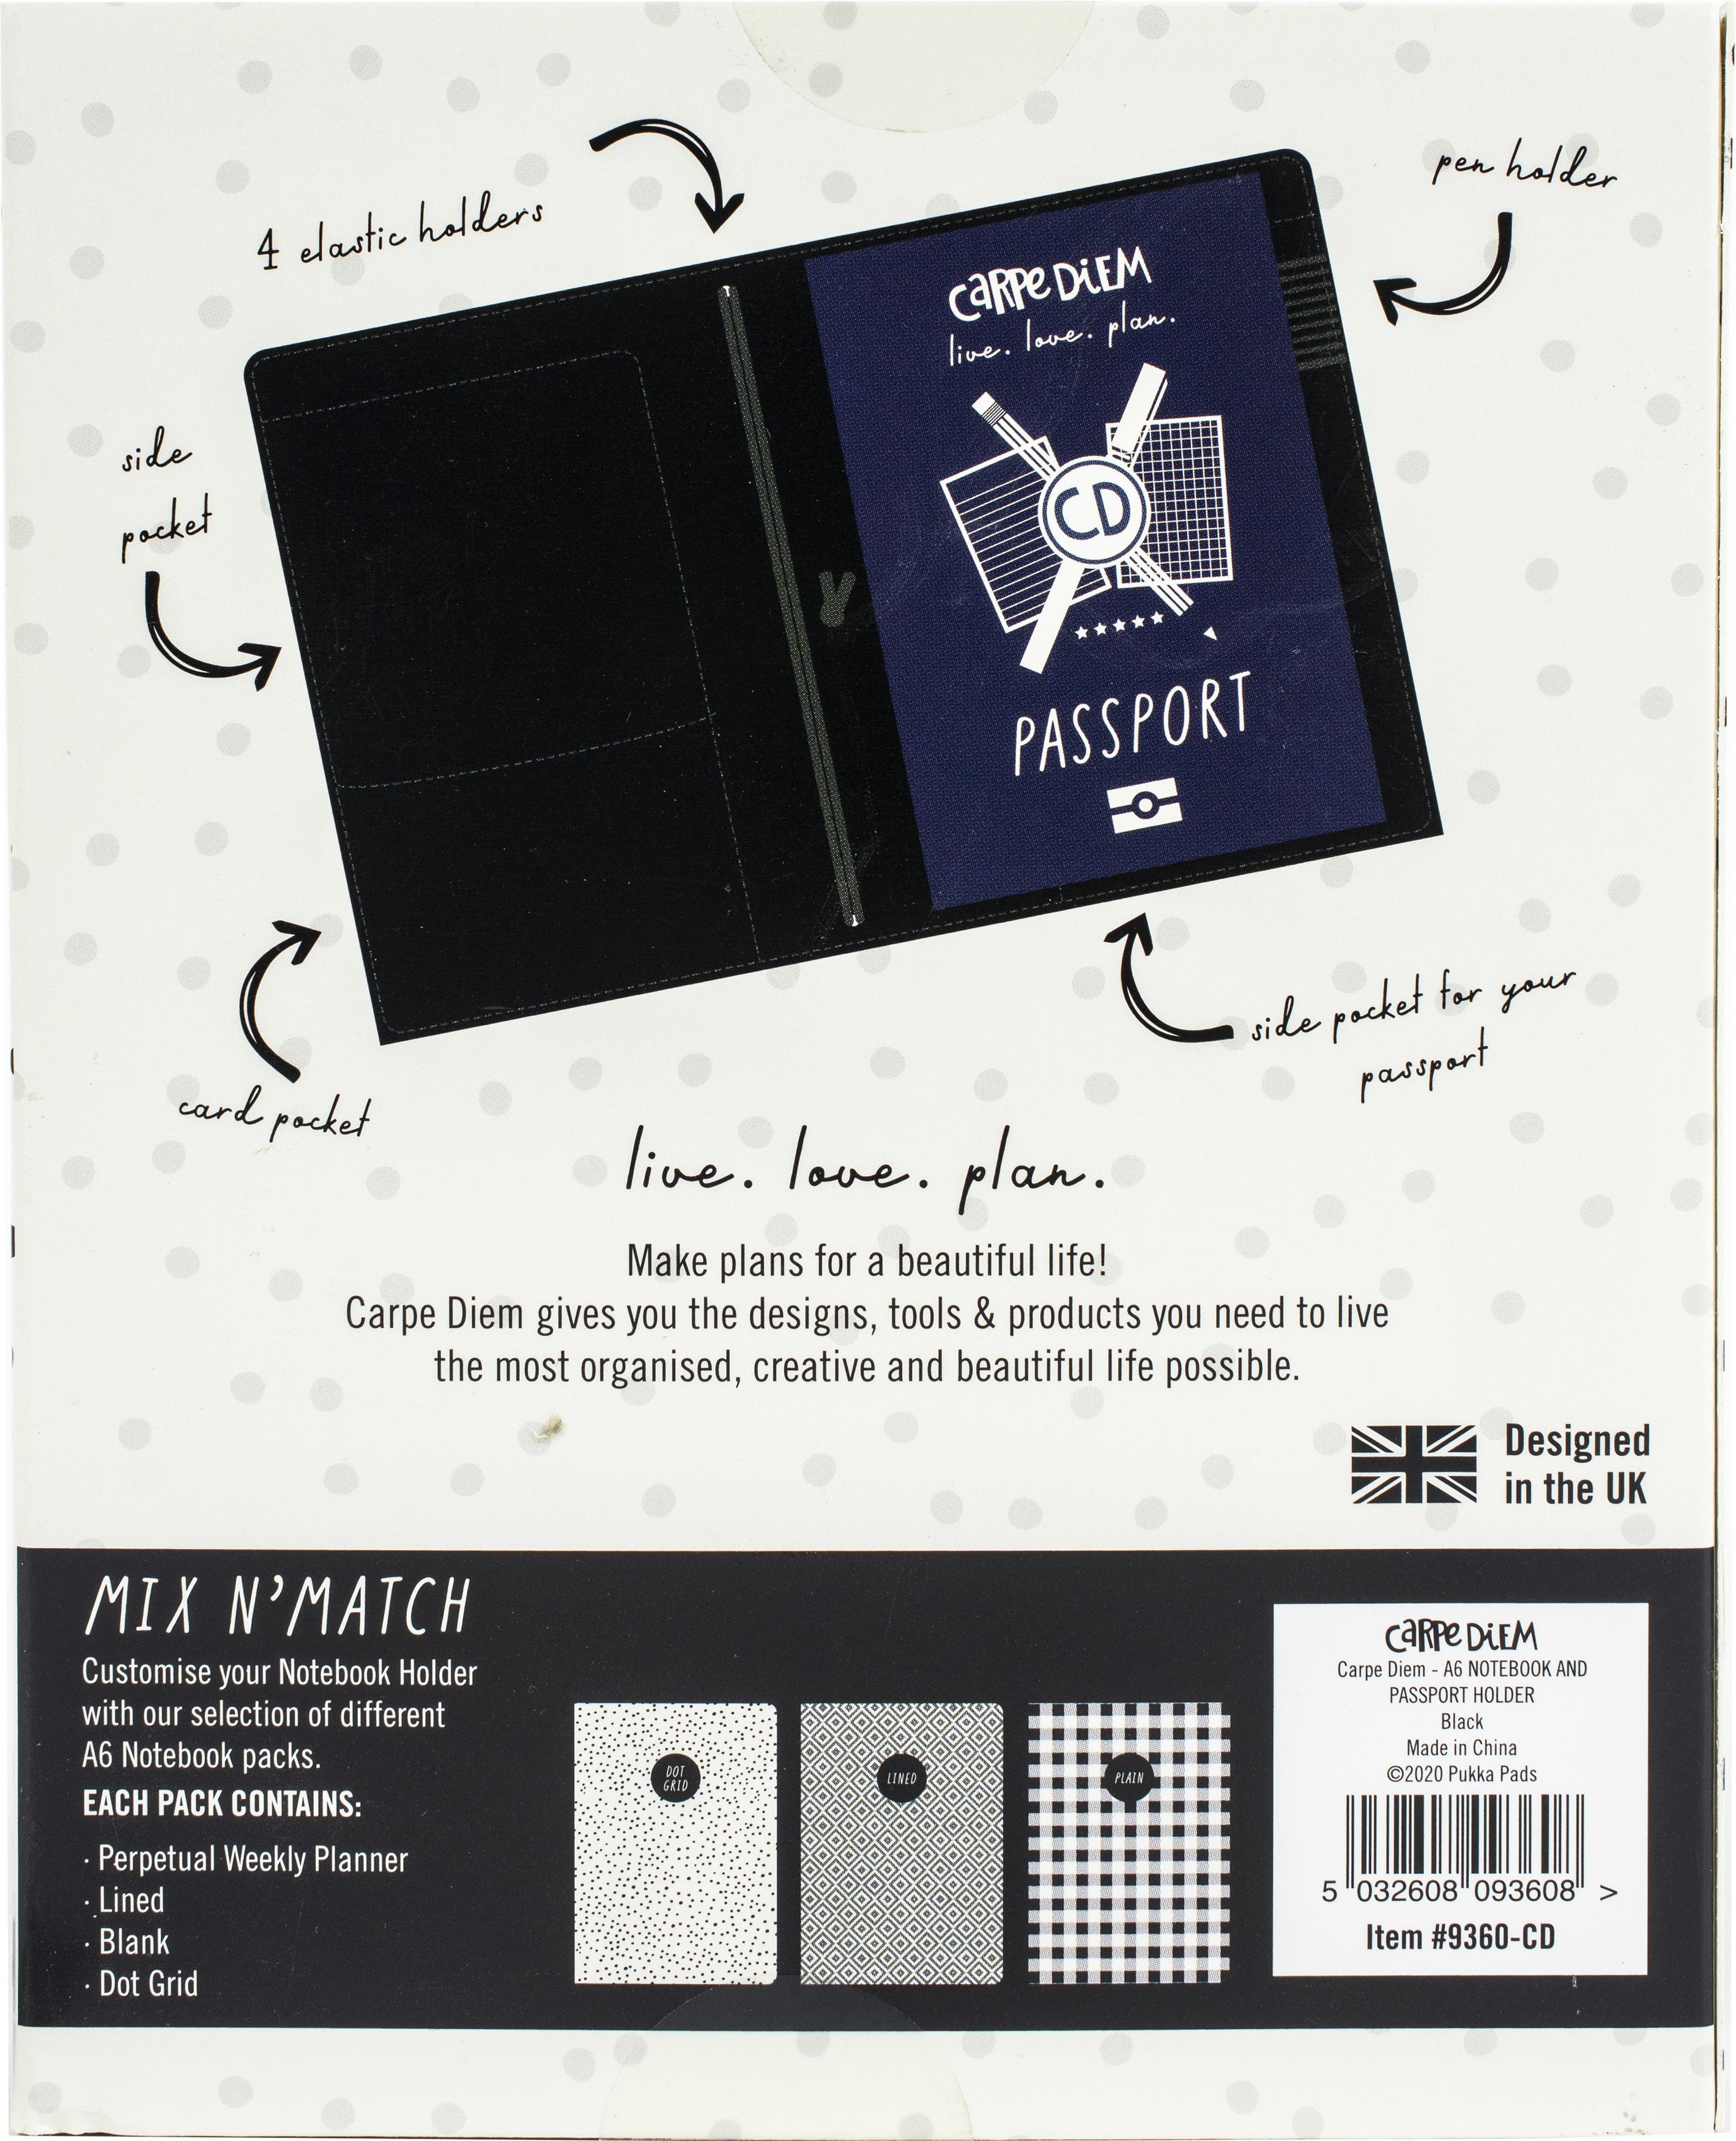 Carpe Diem Notebook & Passport Holder A6-Black